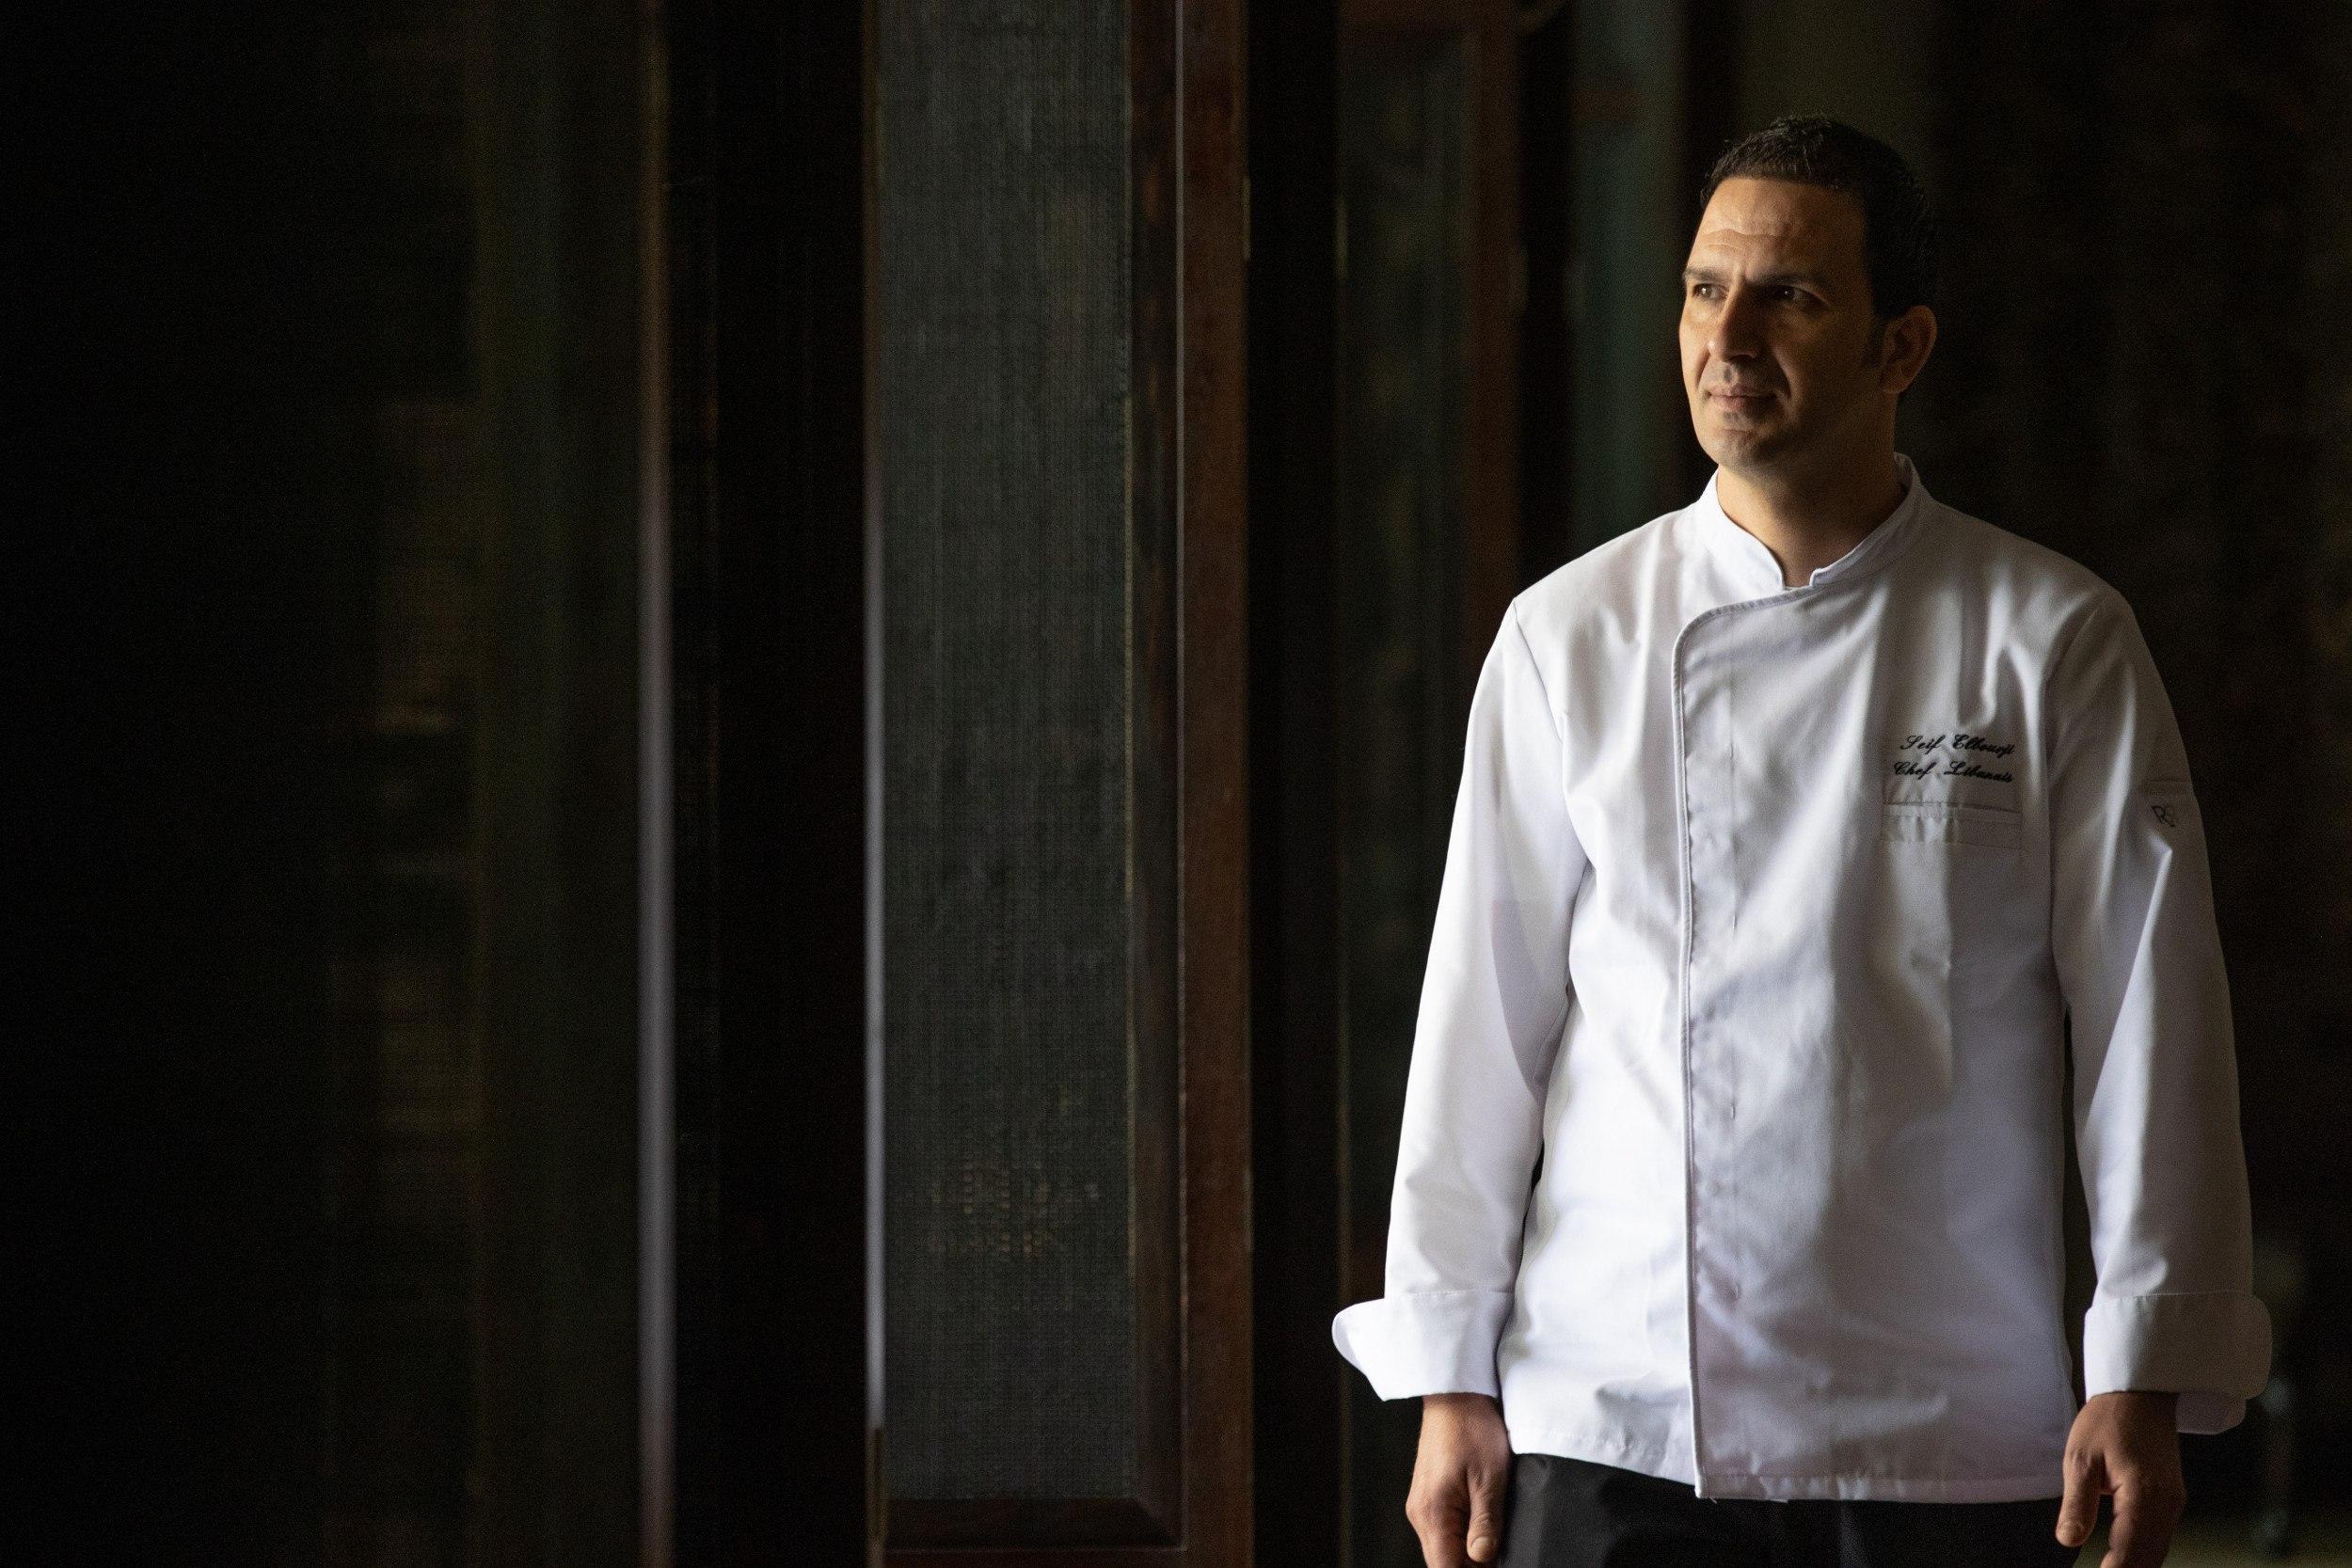 InterContinental-Geneva-Hotel-Woods-restaurant-chef-2